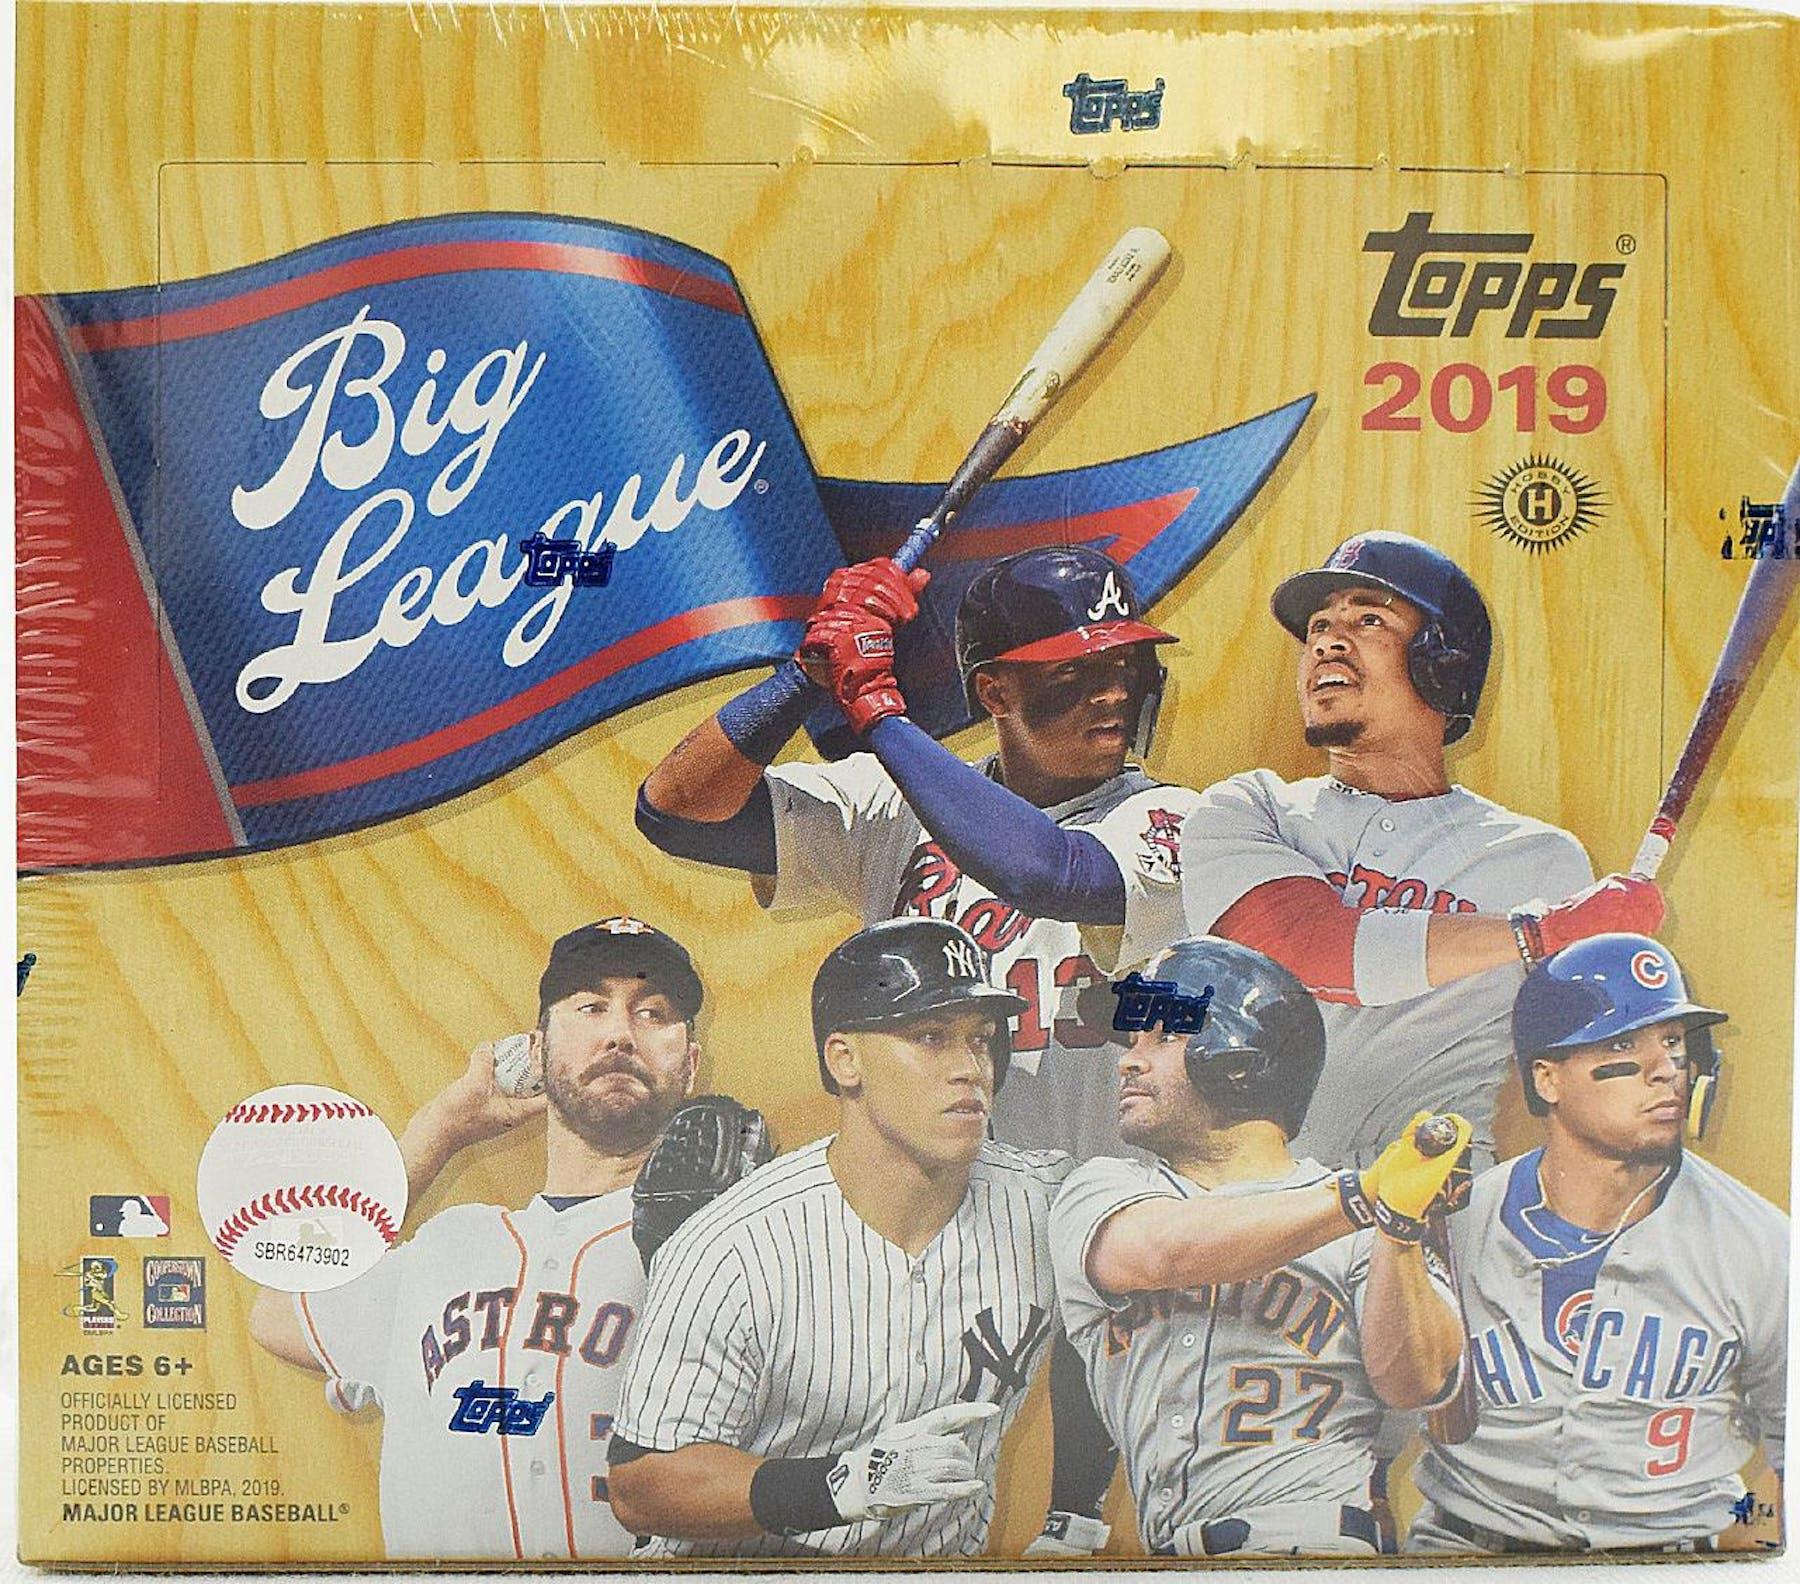 9f81dfddfa 2019 Topps Big League Baseball Hobby Box